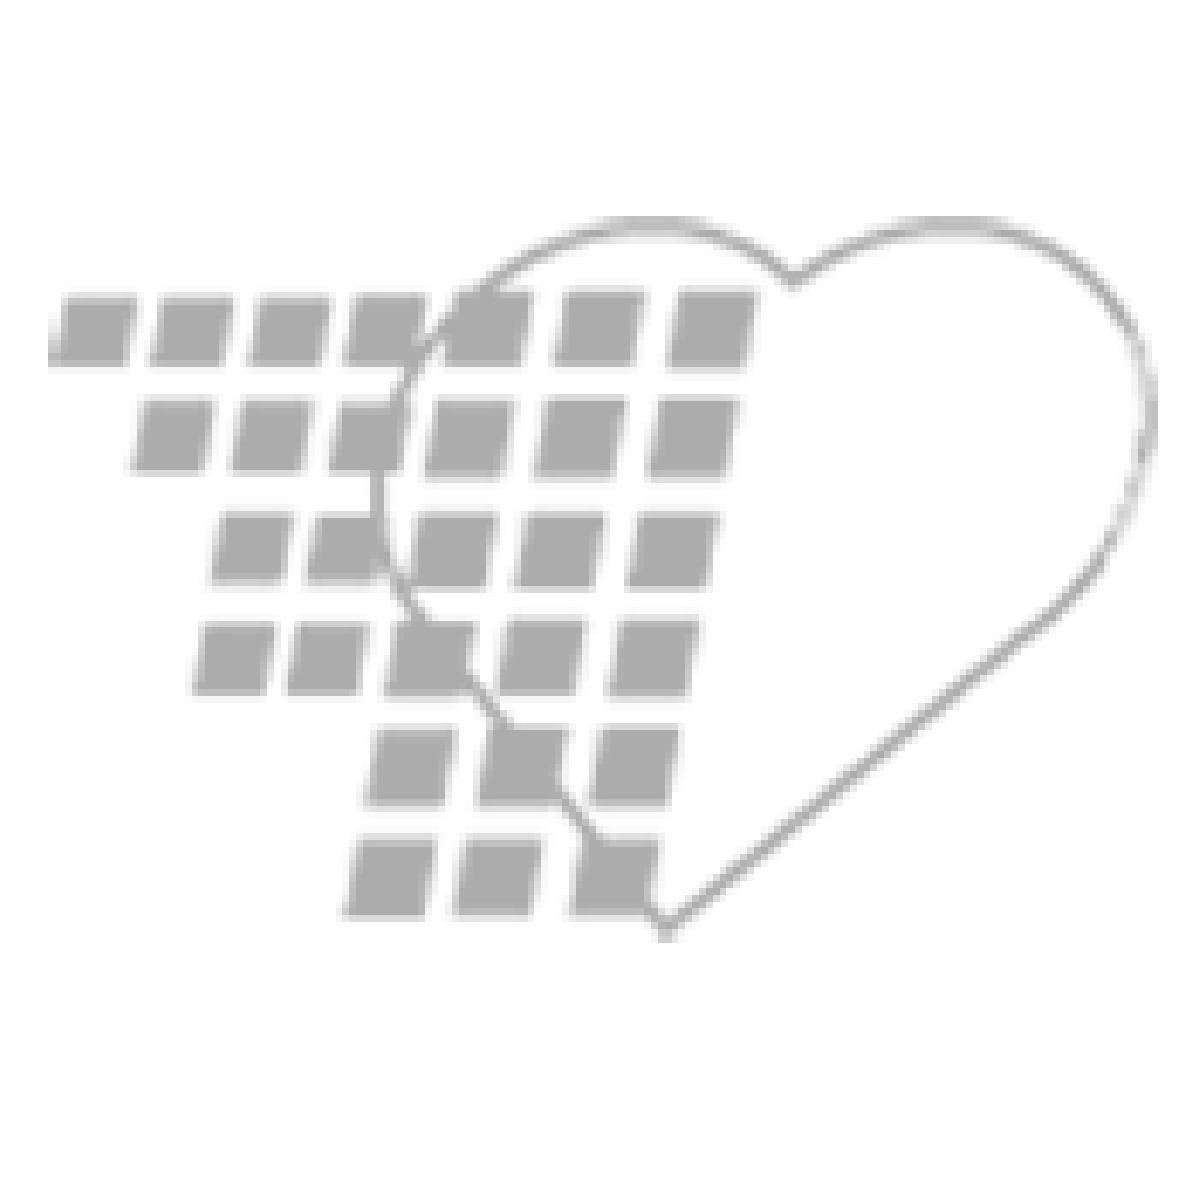 06-74-7003 - Medicine Spoon - 10 mL